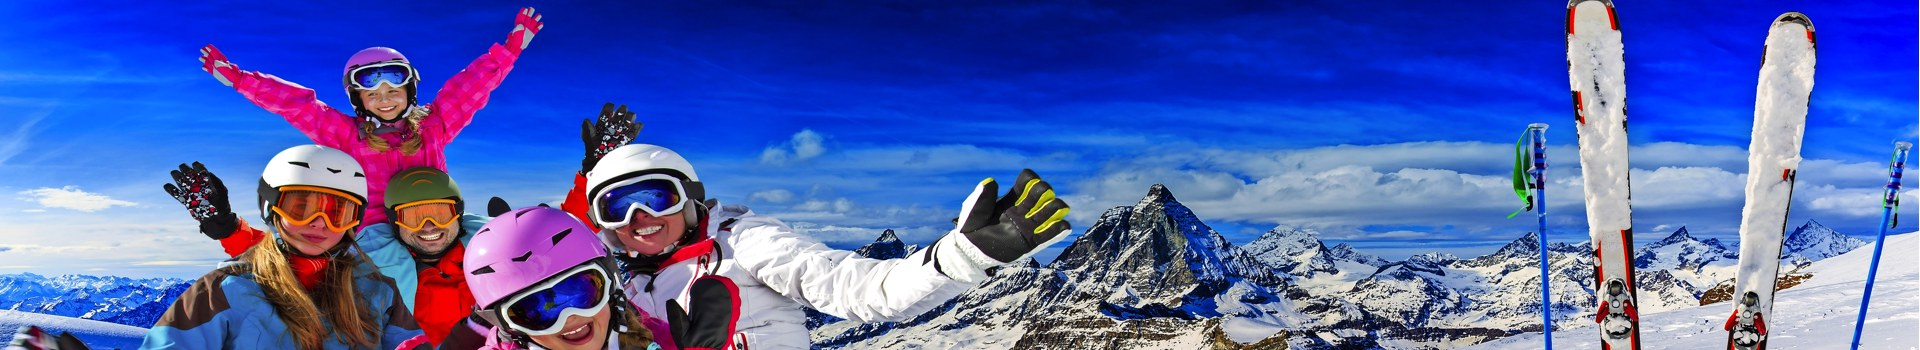 Schnabel   Ski